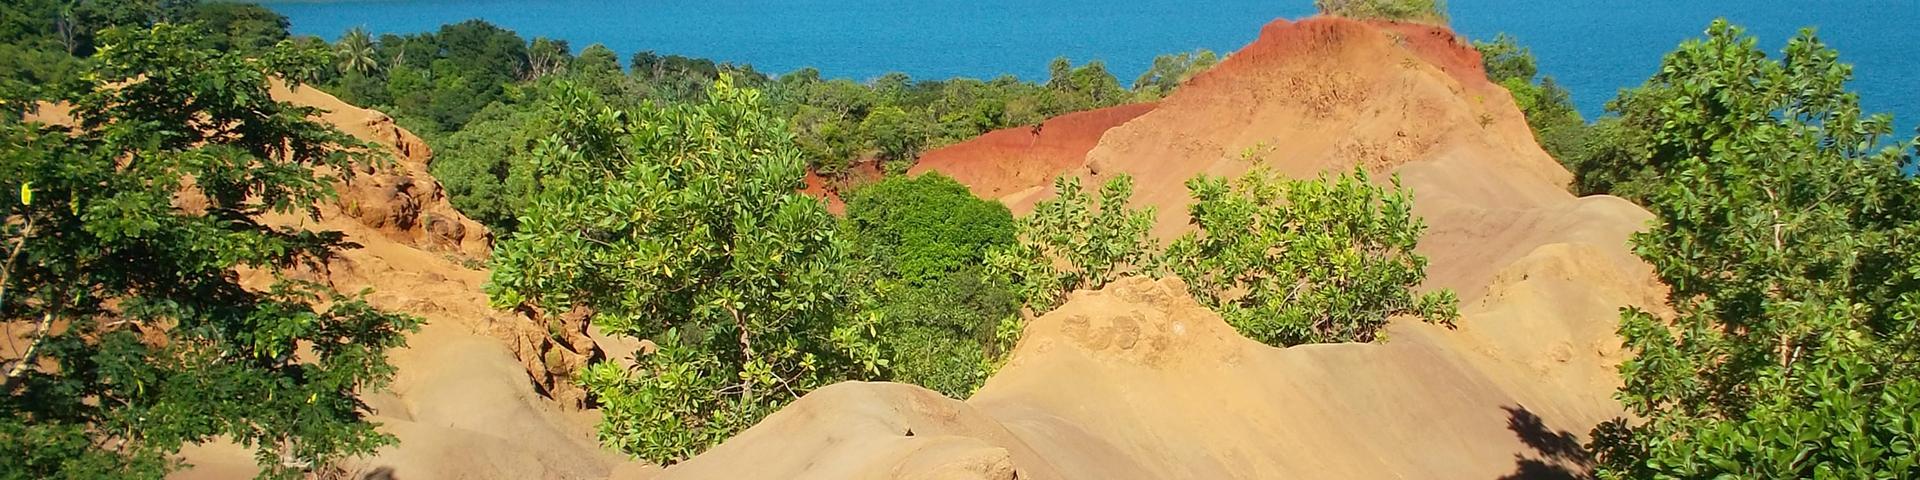 Padza, Mayotte